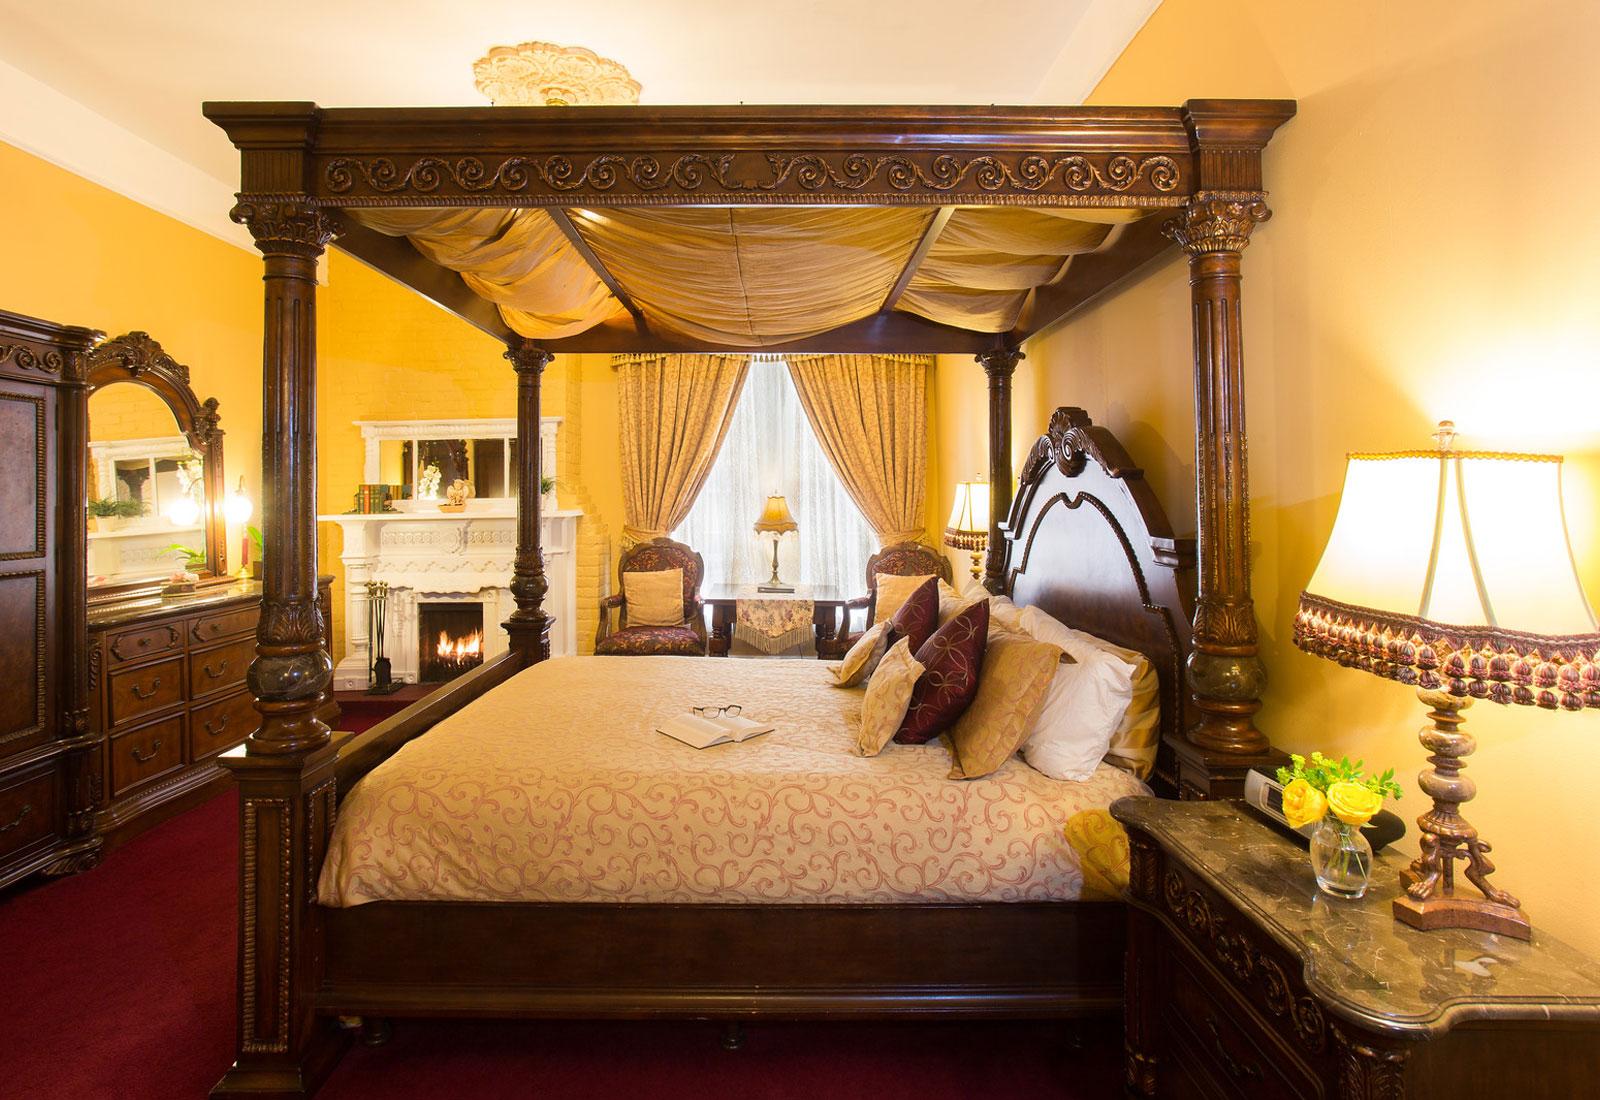 Queen Anne Bedroom Suite Victorian Boutique Hotel In San Francisco Queen Anne Hotel